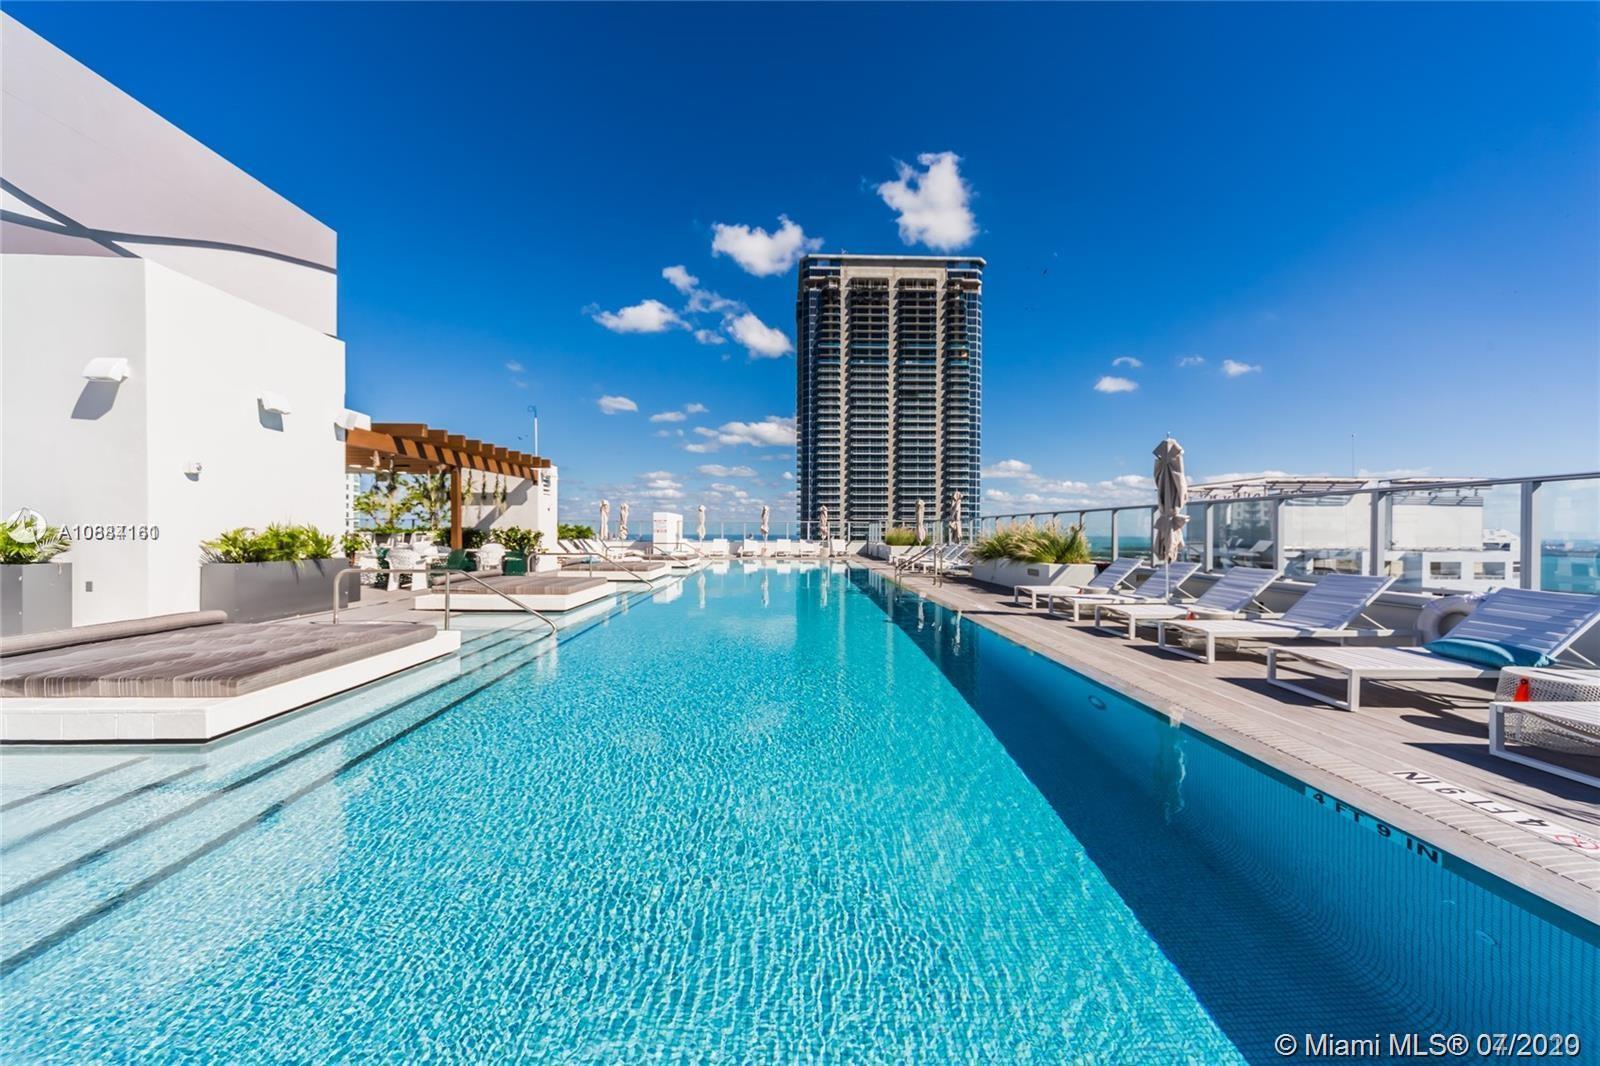 1010 Brickell #4405 - 1010 Brickell Ave #4405, Miami, FL 33131